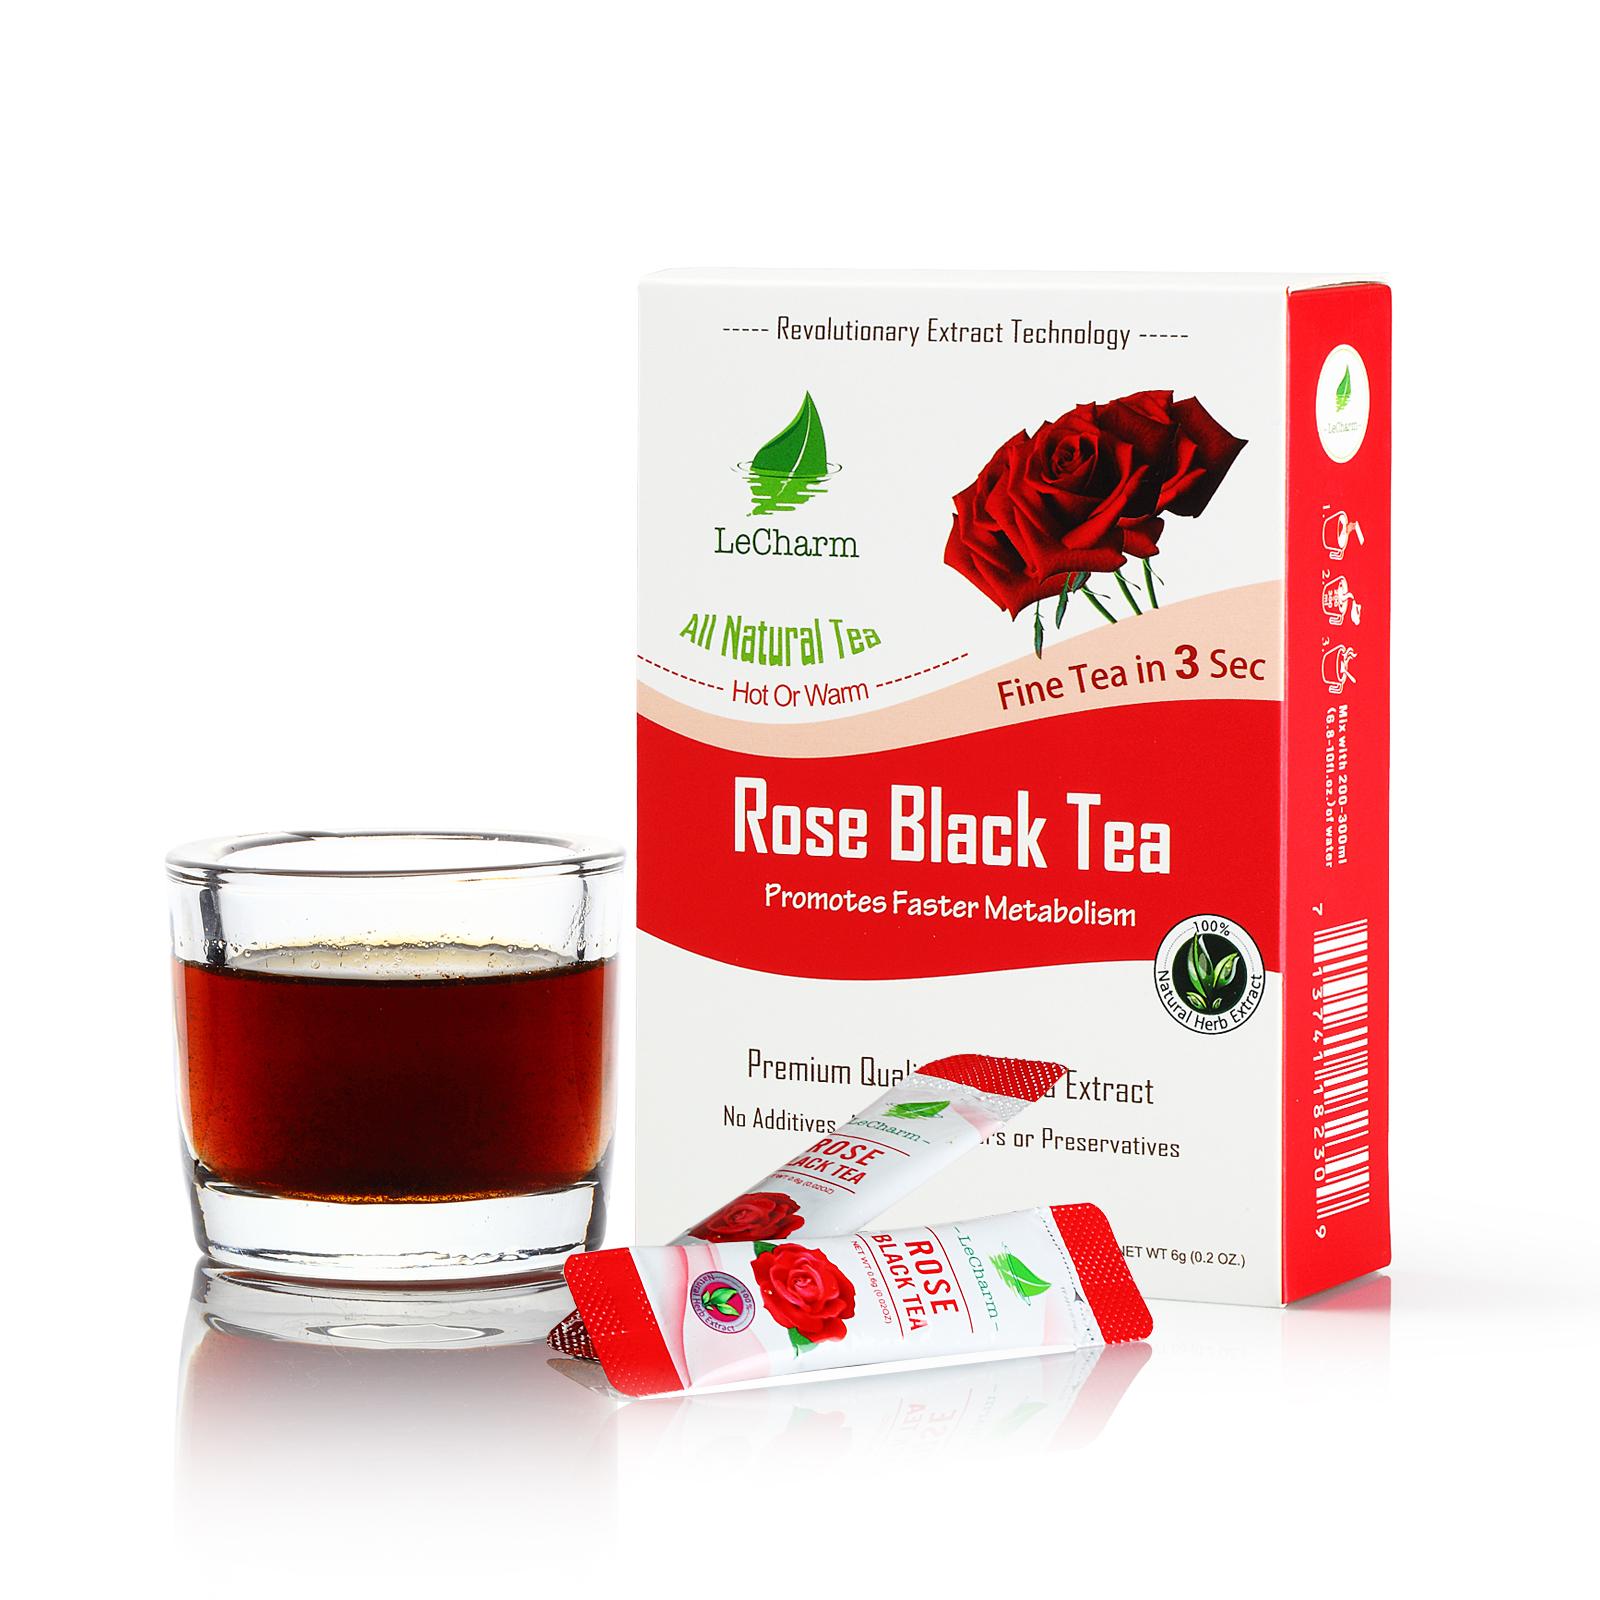 Original Soothing Vital Beauty Natural Detox Smooth Scented With Flowers Rose Black Tea 10 Sachets/ Box - 4uTea | 4uTea.com